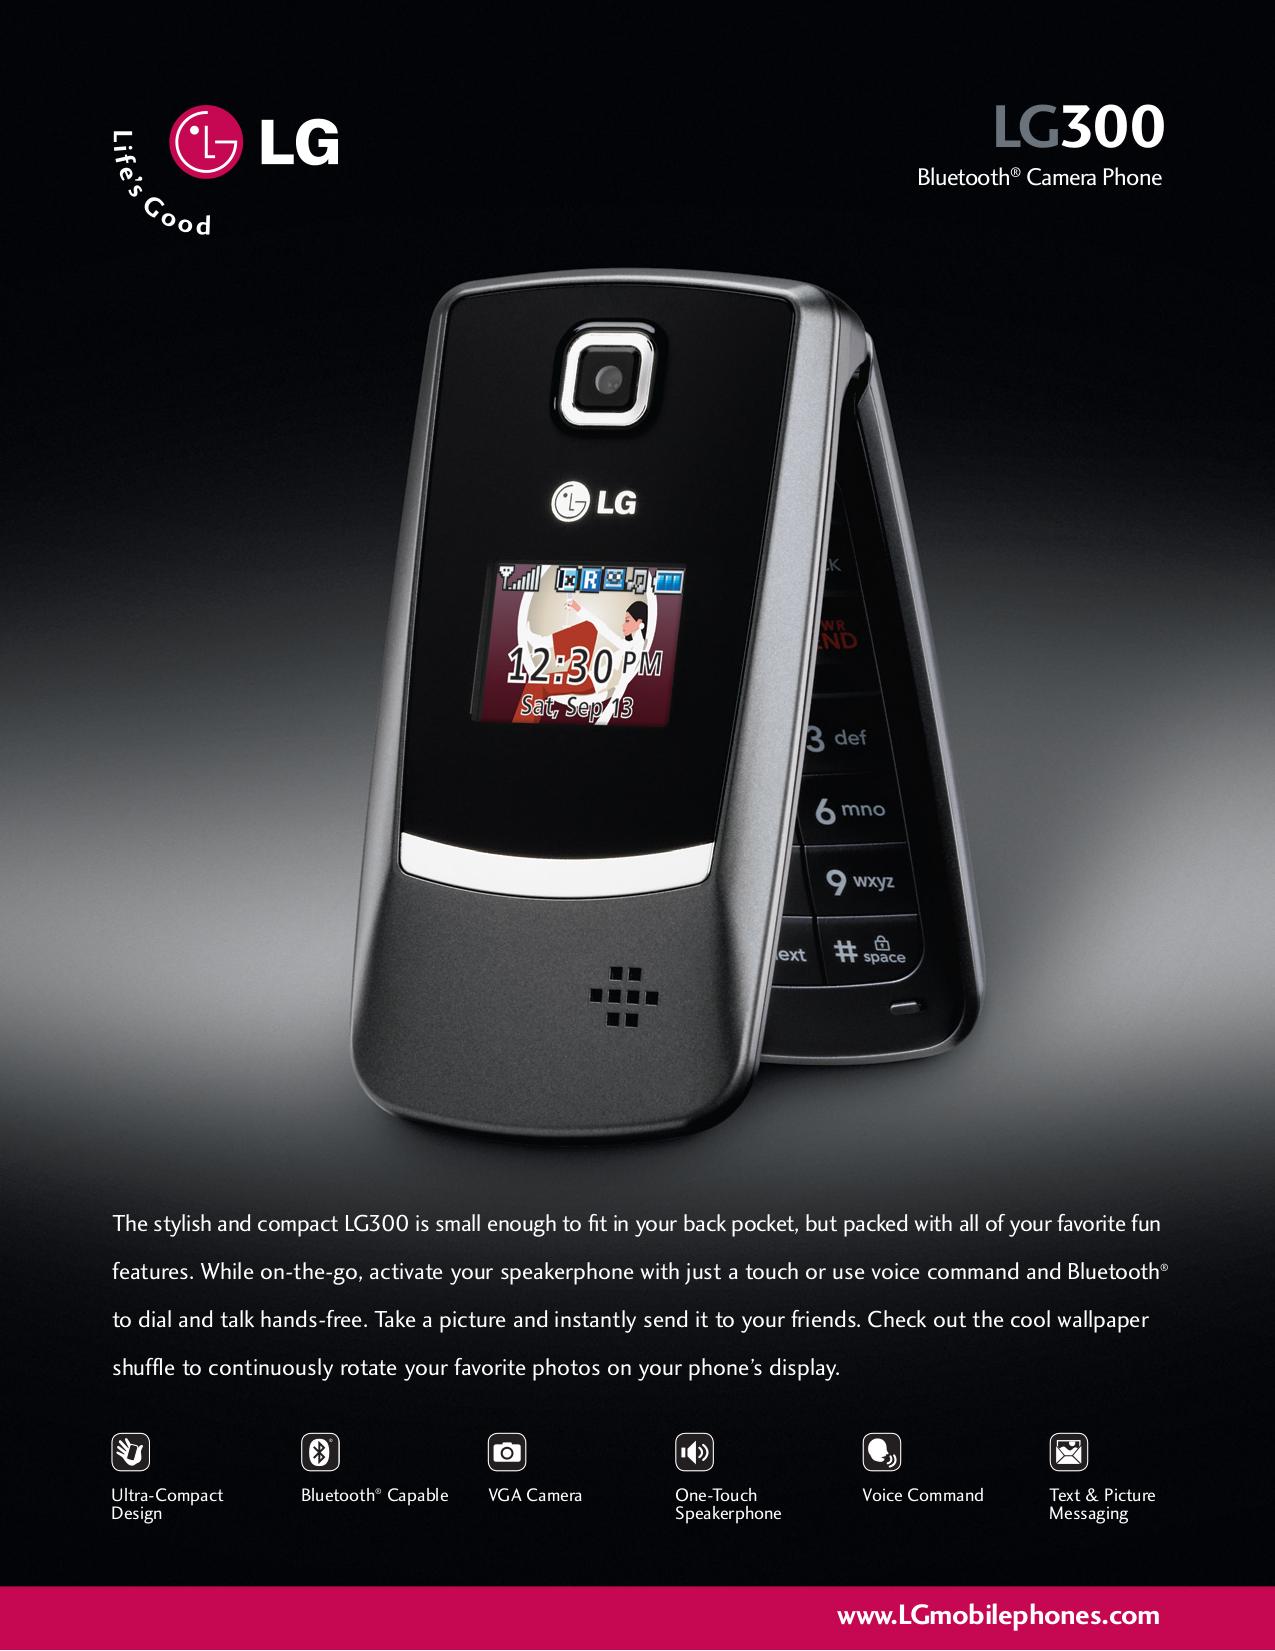 lg lg300 cell phone manual